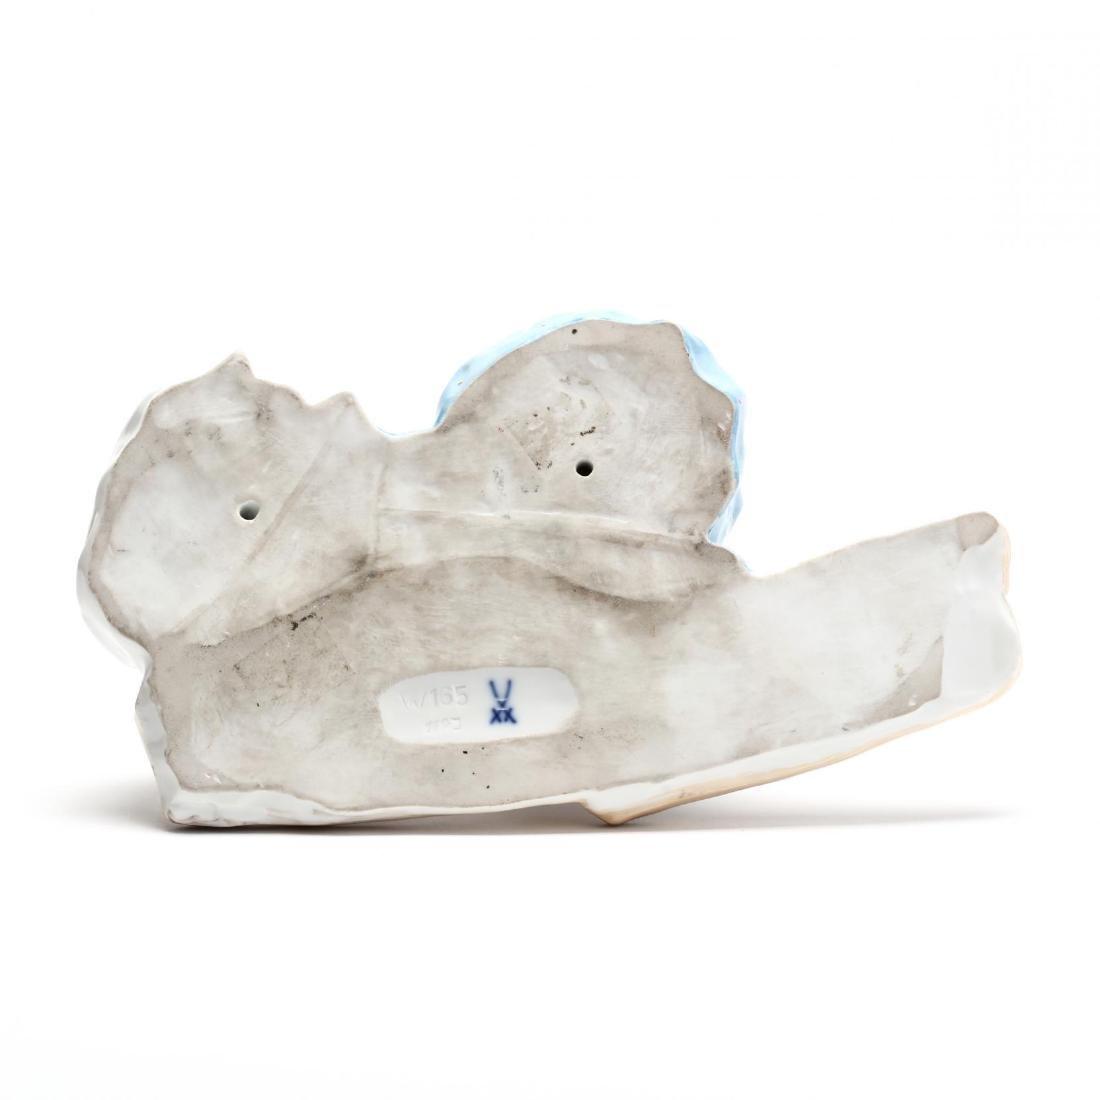 Meissen Hentschel Porcelain Figural Composition - 5